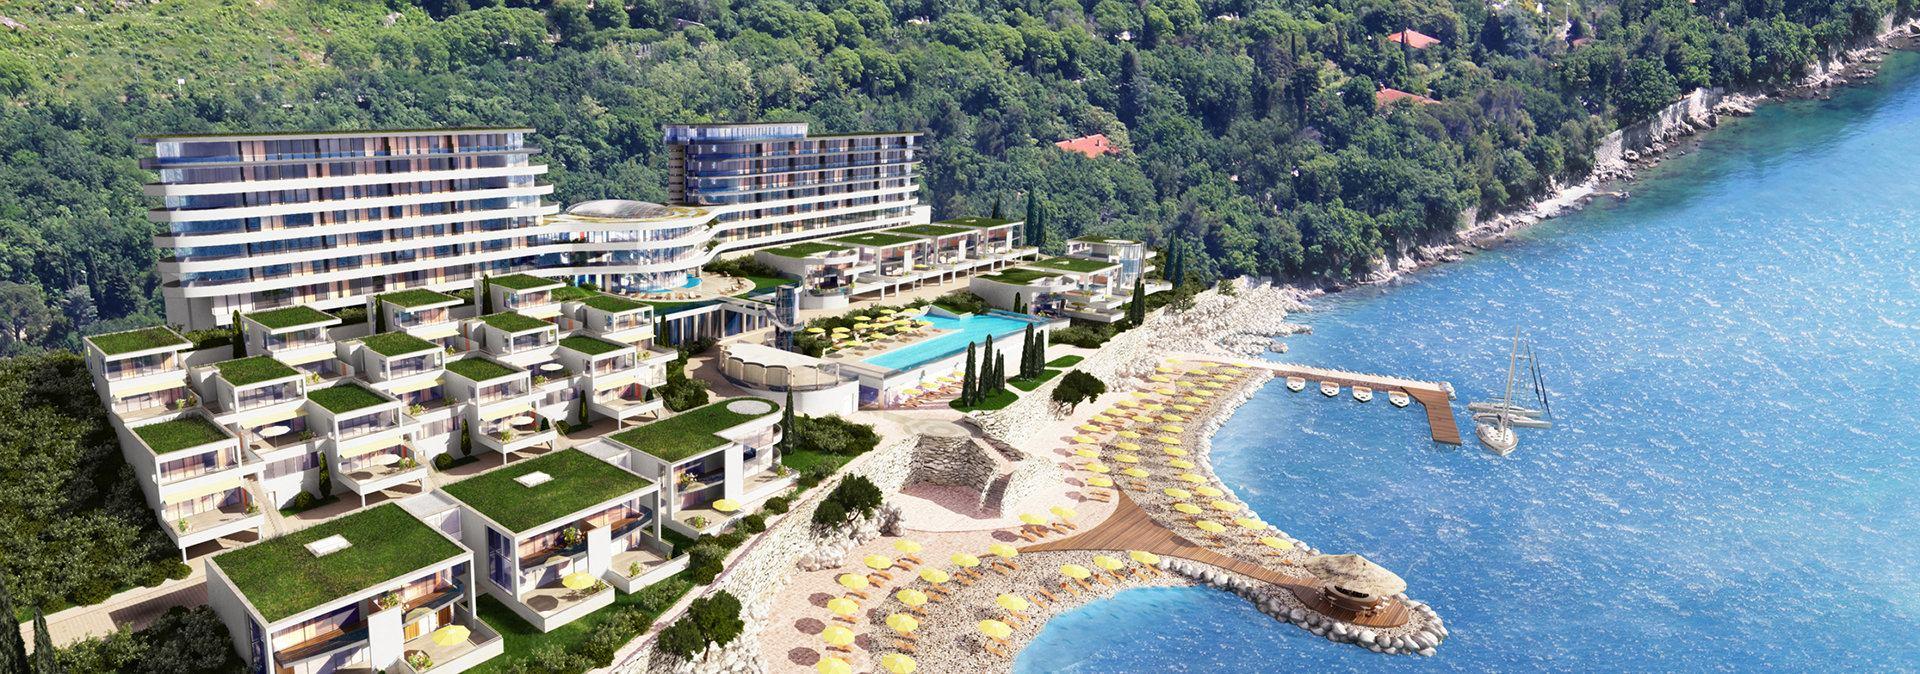 Hilton Rijeka Costabella Beach Resort and Spa, Rijeka